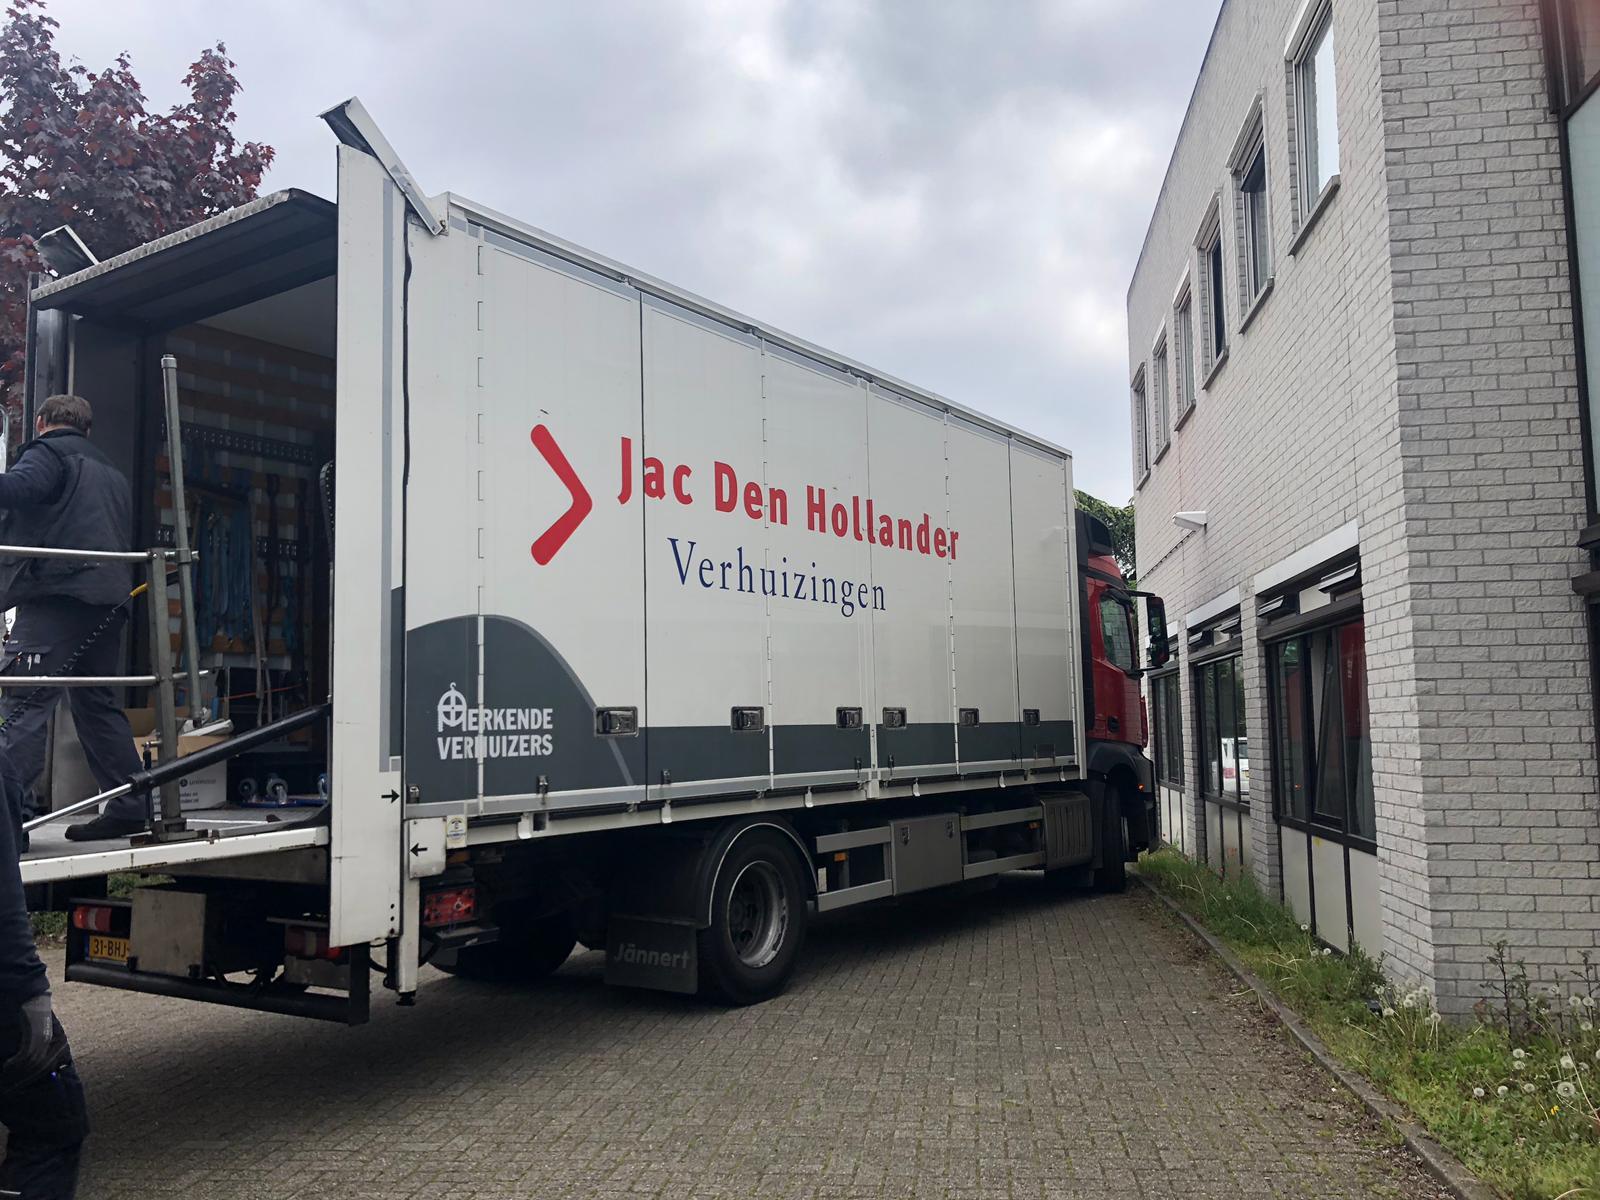 Jac. Den Hollander uit Rotterdam helpt ook!